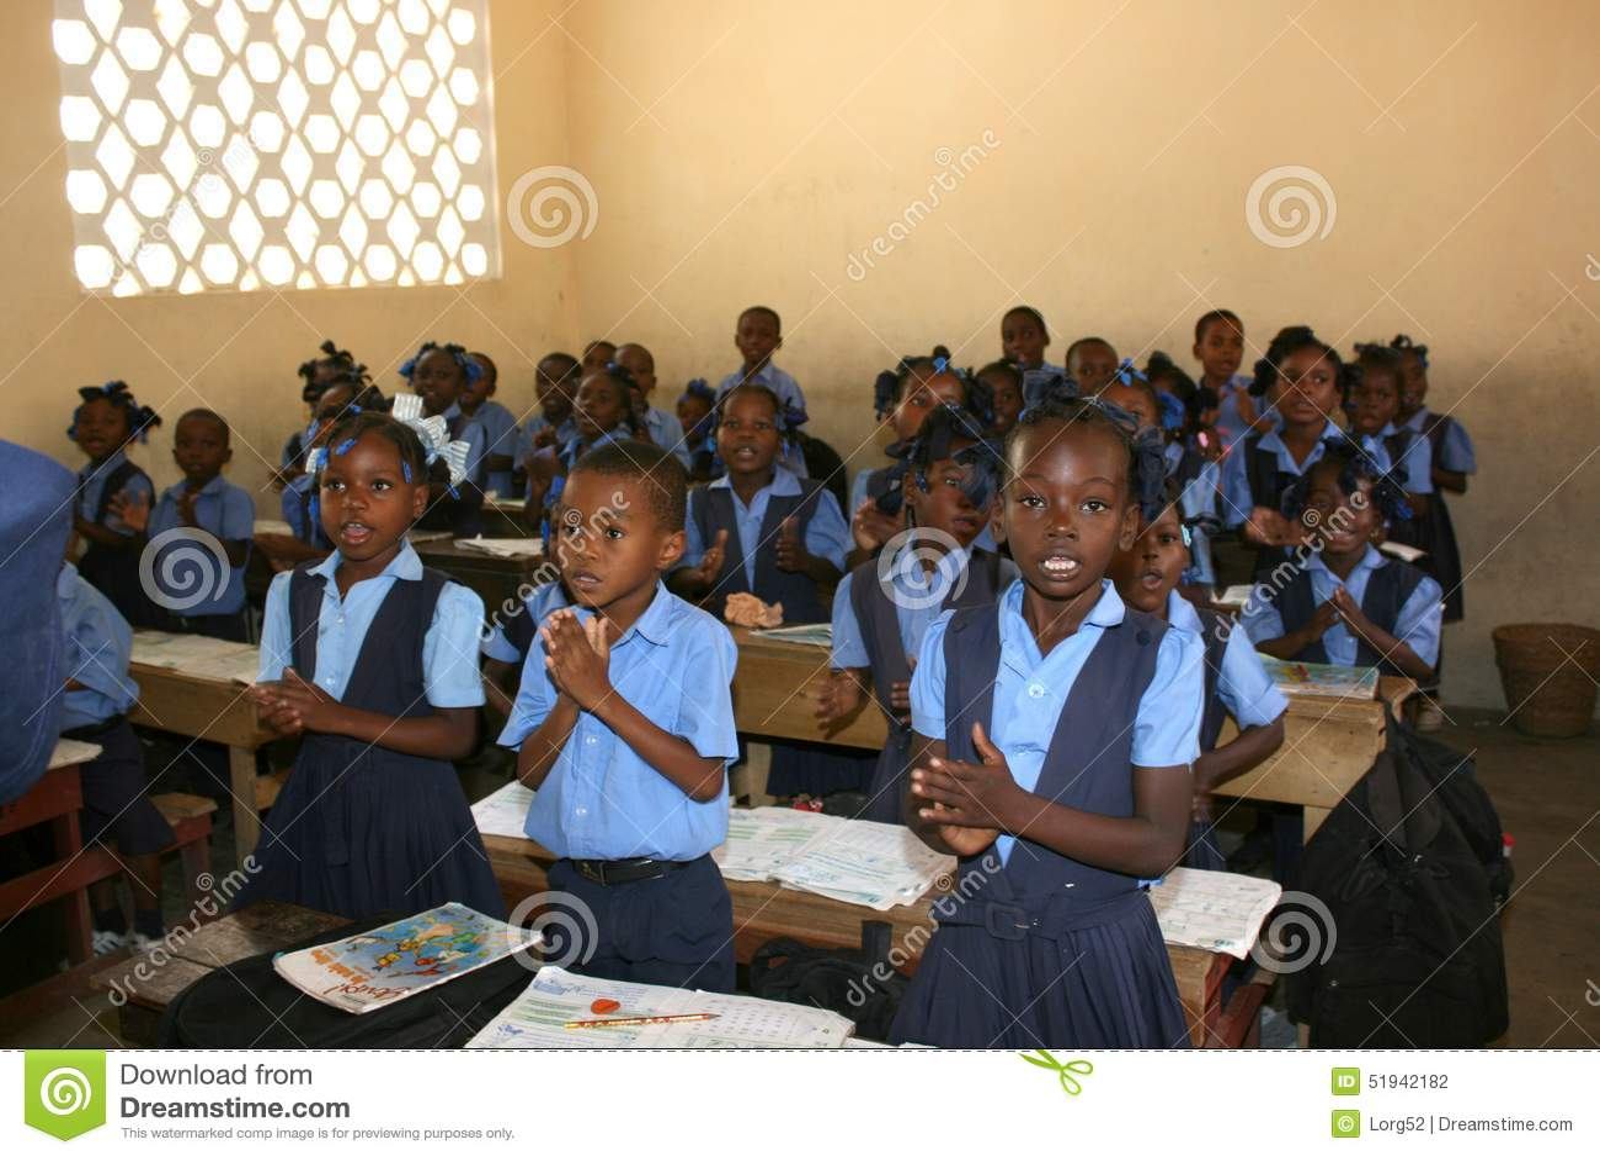 Haitian School Children Welcome Visitors In Their